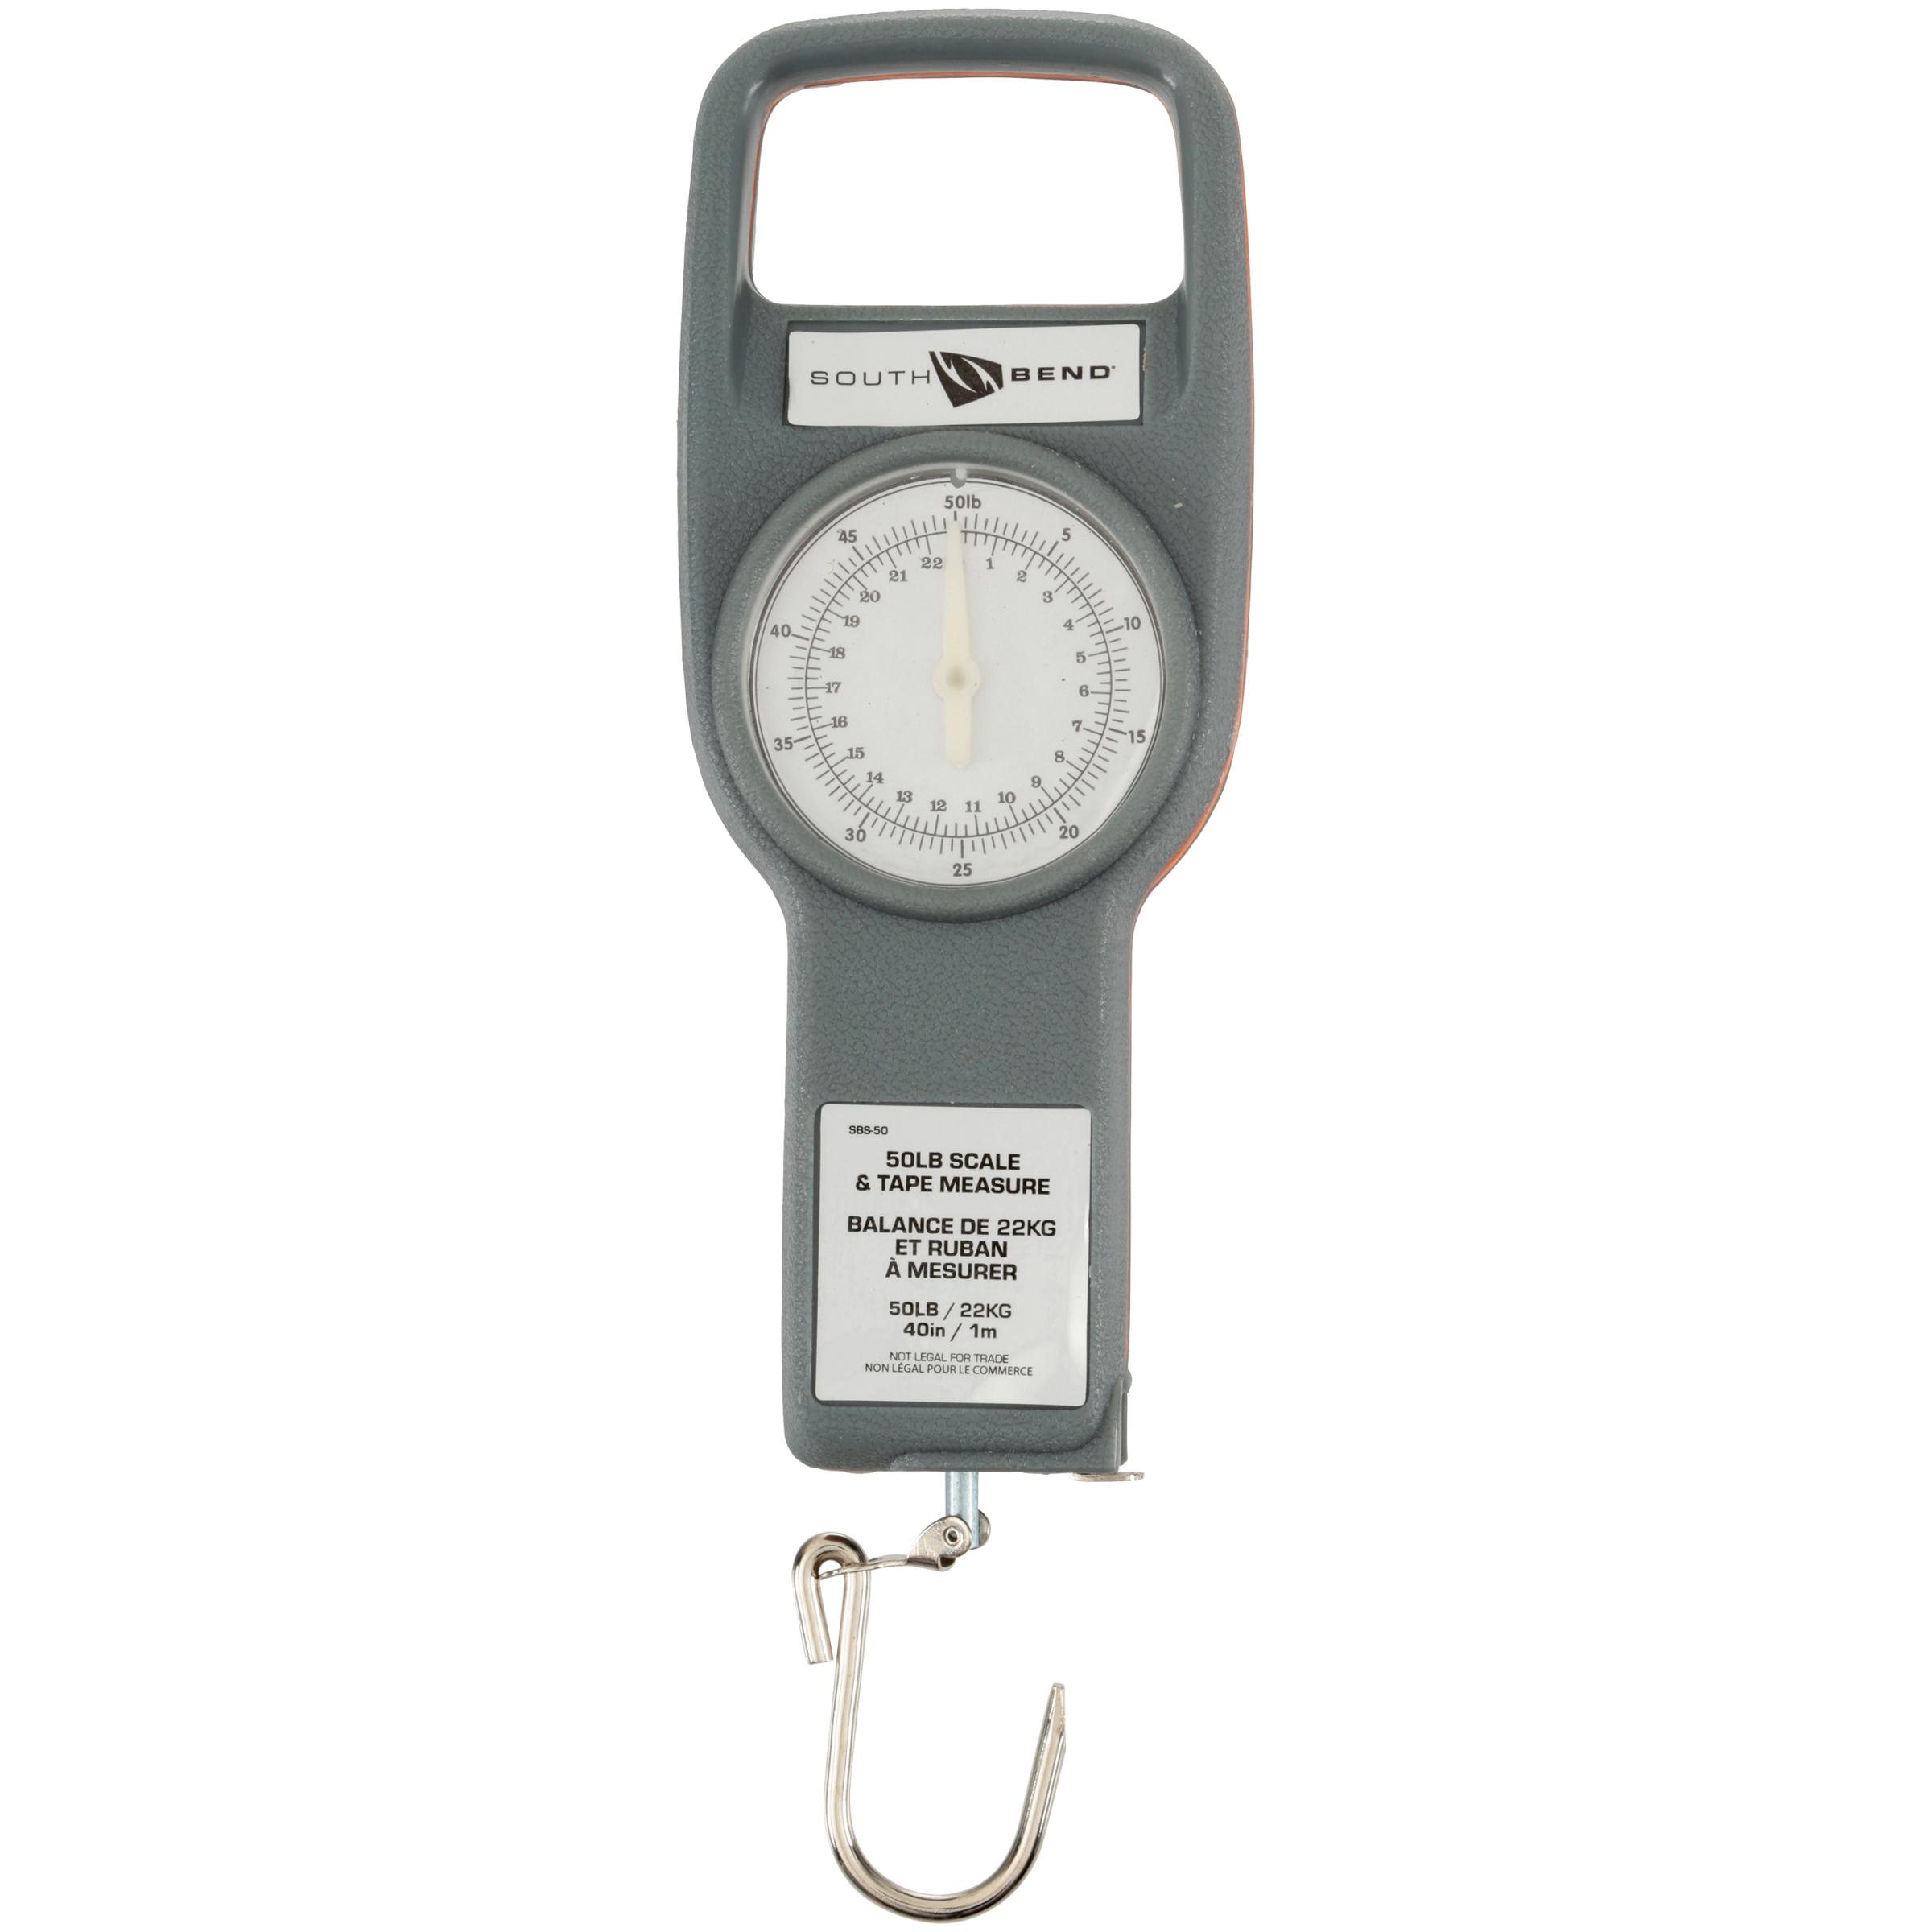 South Bend® 50 lb. Scale & Tape Measure